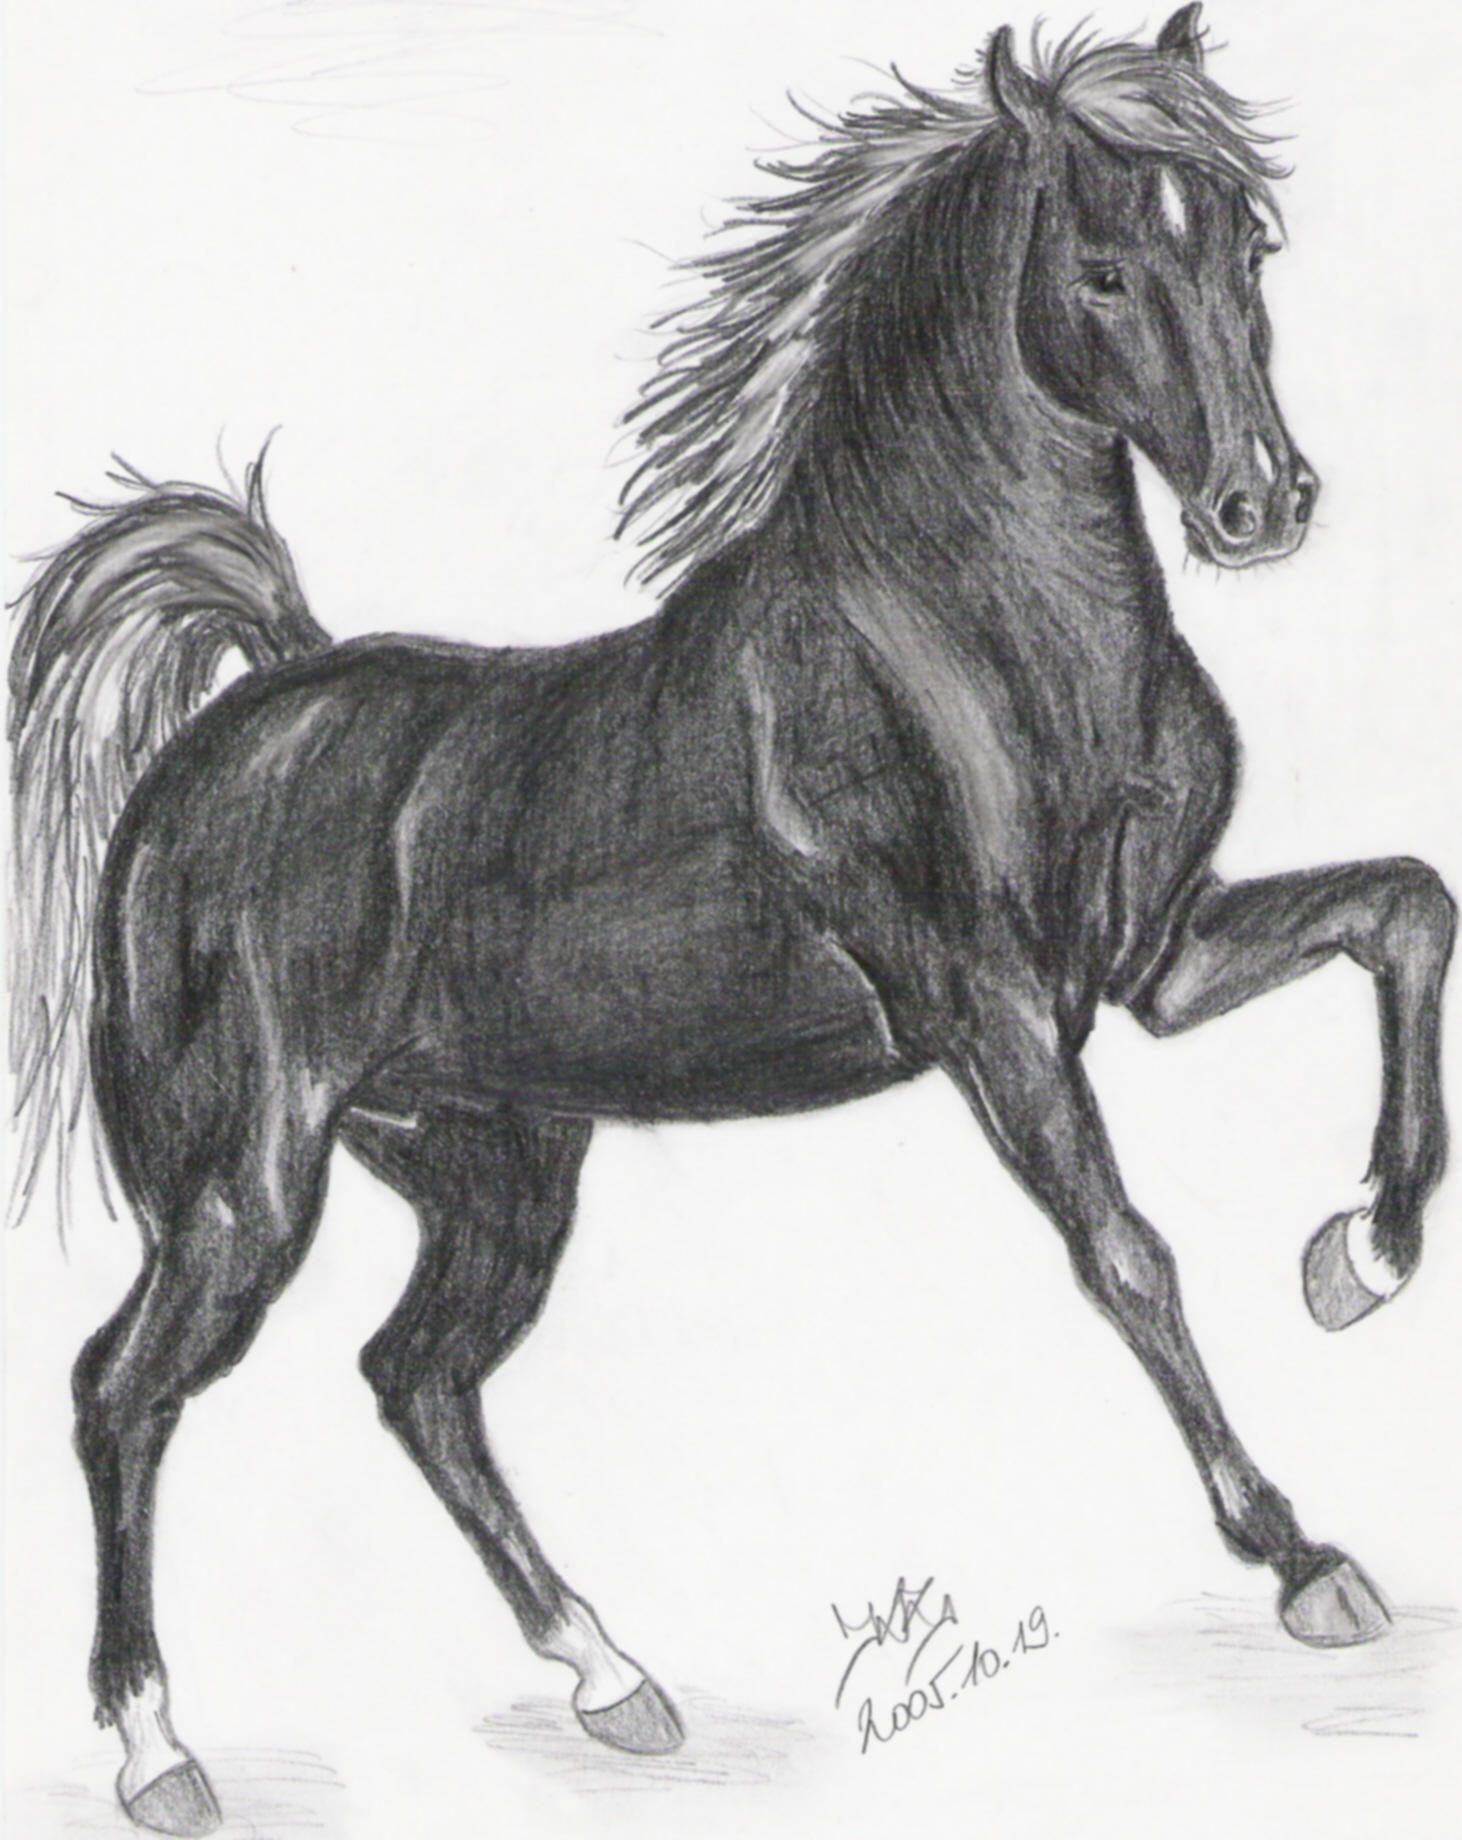 Black horse by Liaram on DeviantArt